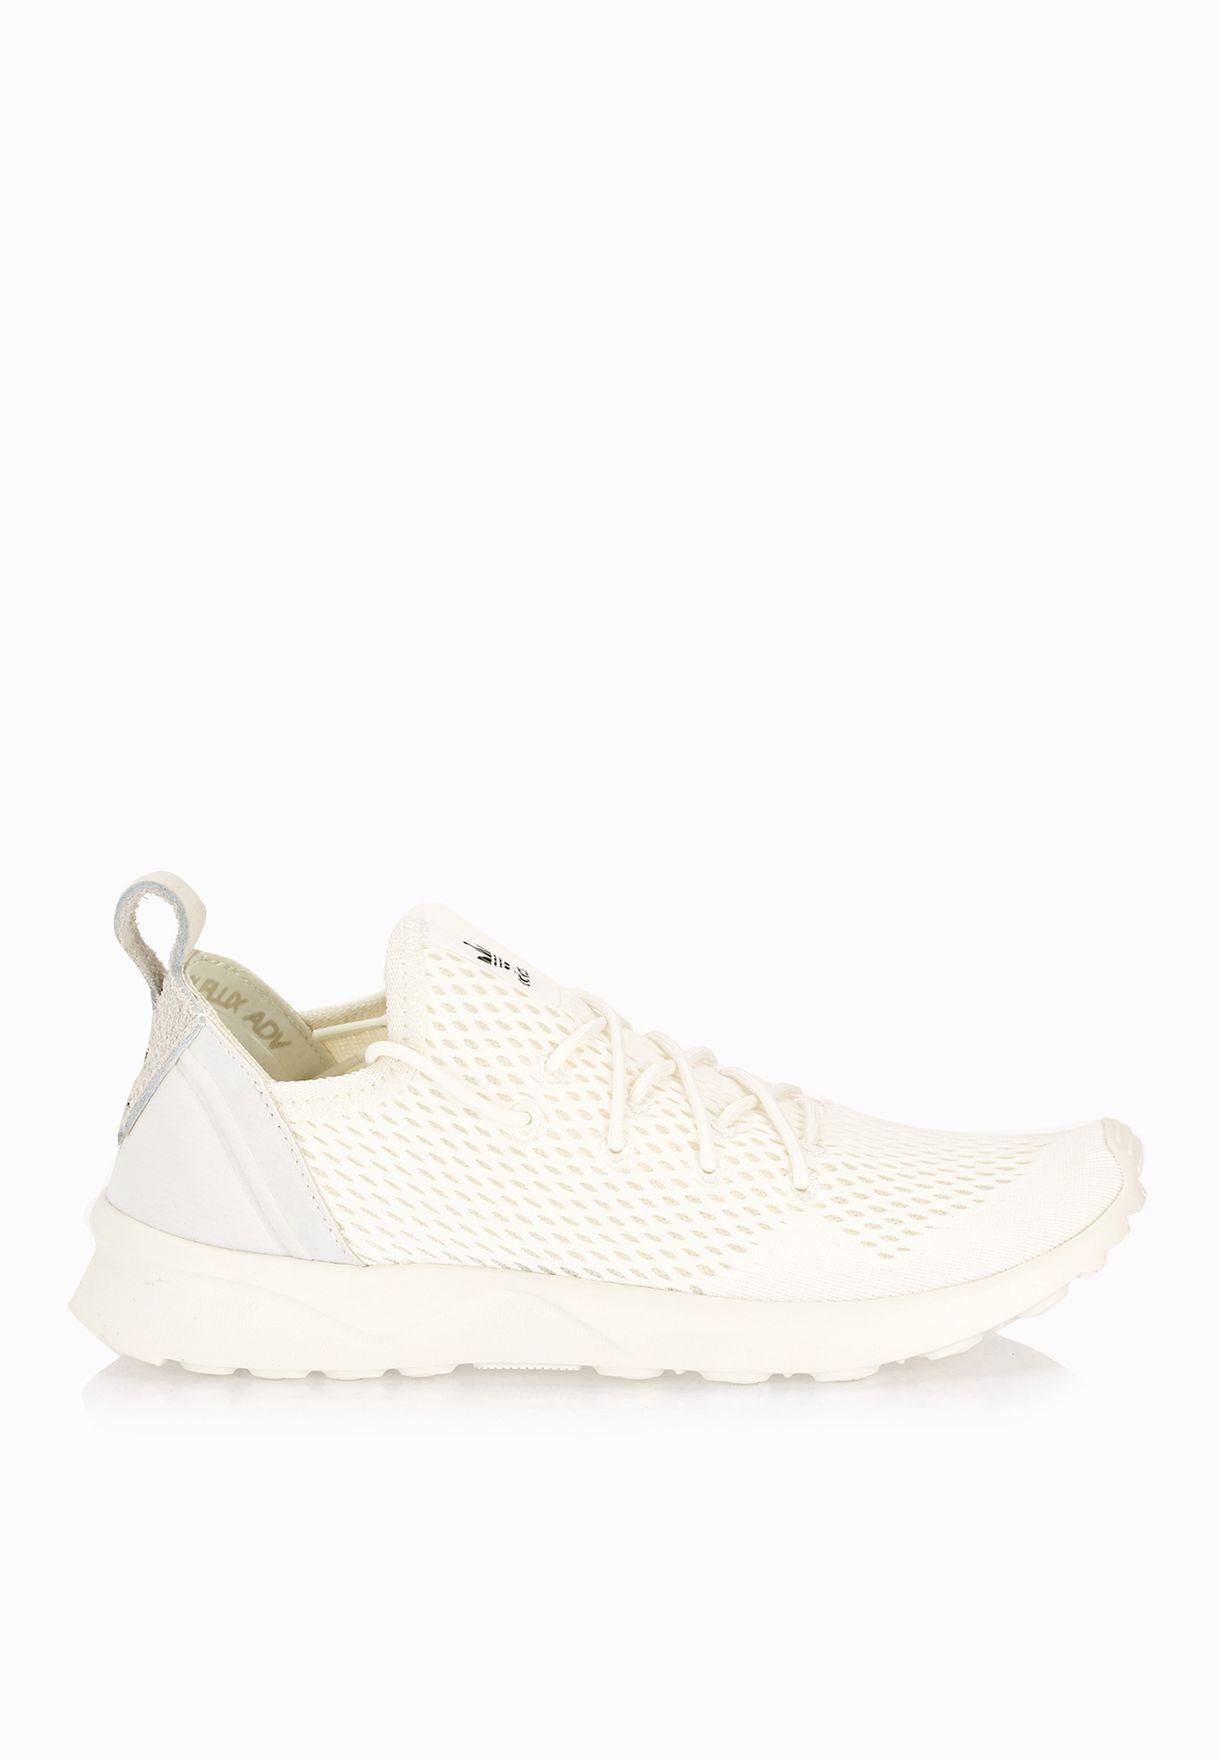 052e45043f653 Shop adidas Originals white Zx Flux ADV Virtue BB4247 for Women in ...